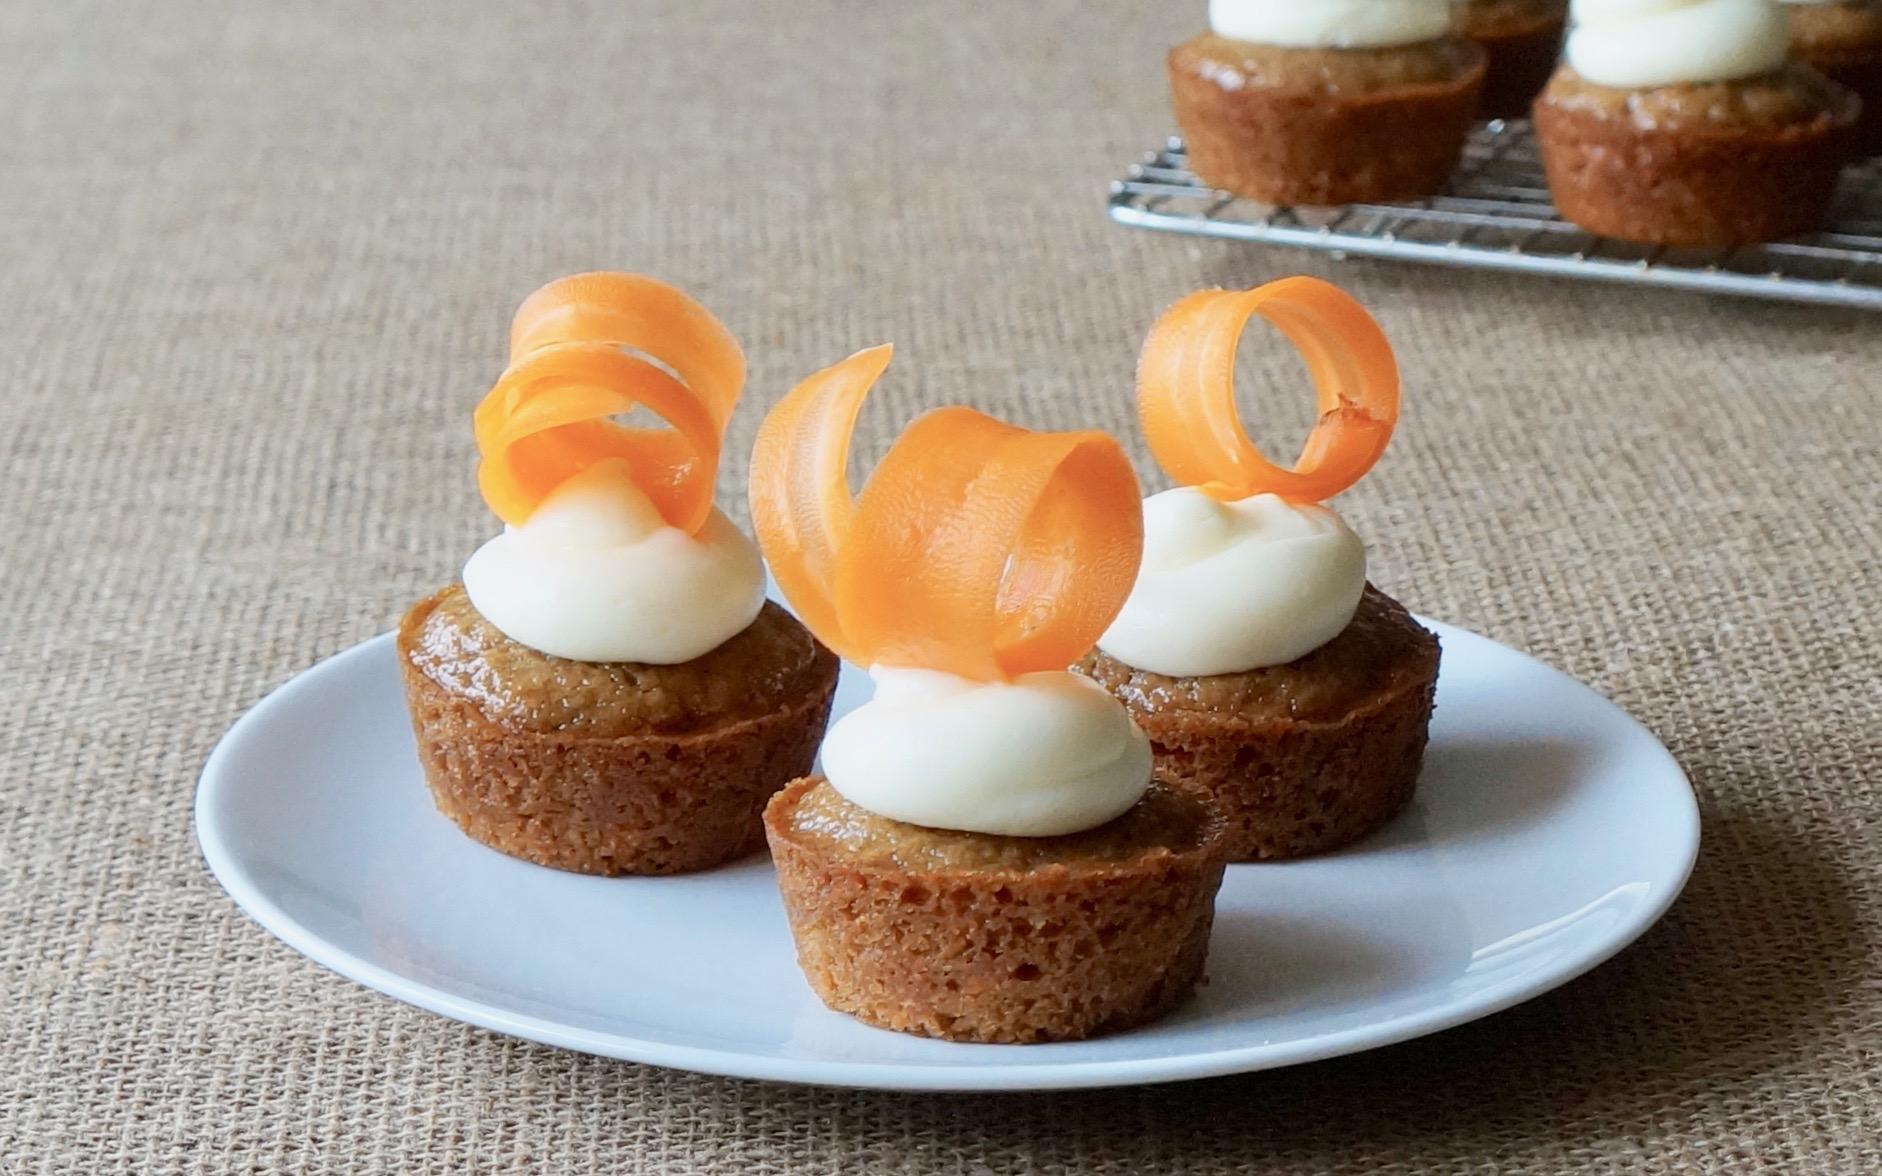 Buttermilk Carrot Cupcakes Rebecca Gordon Editor In Cheif Buttermilk Lipstick Culinary Entertaining Techniques Southern Hostess-RebeccaGordon-Pastry-Chef-Birmingham-Alabama